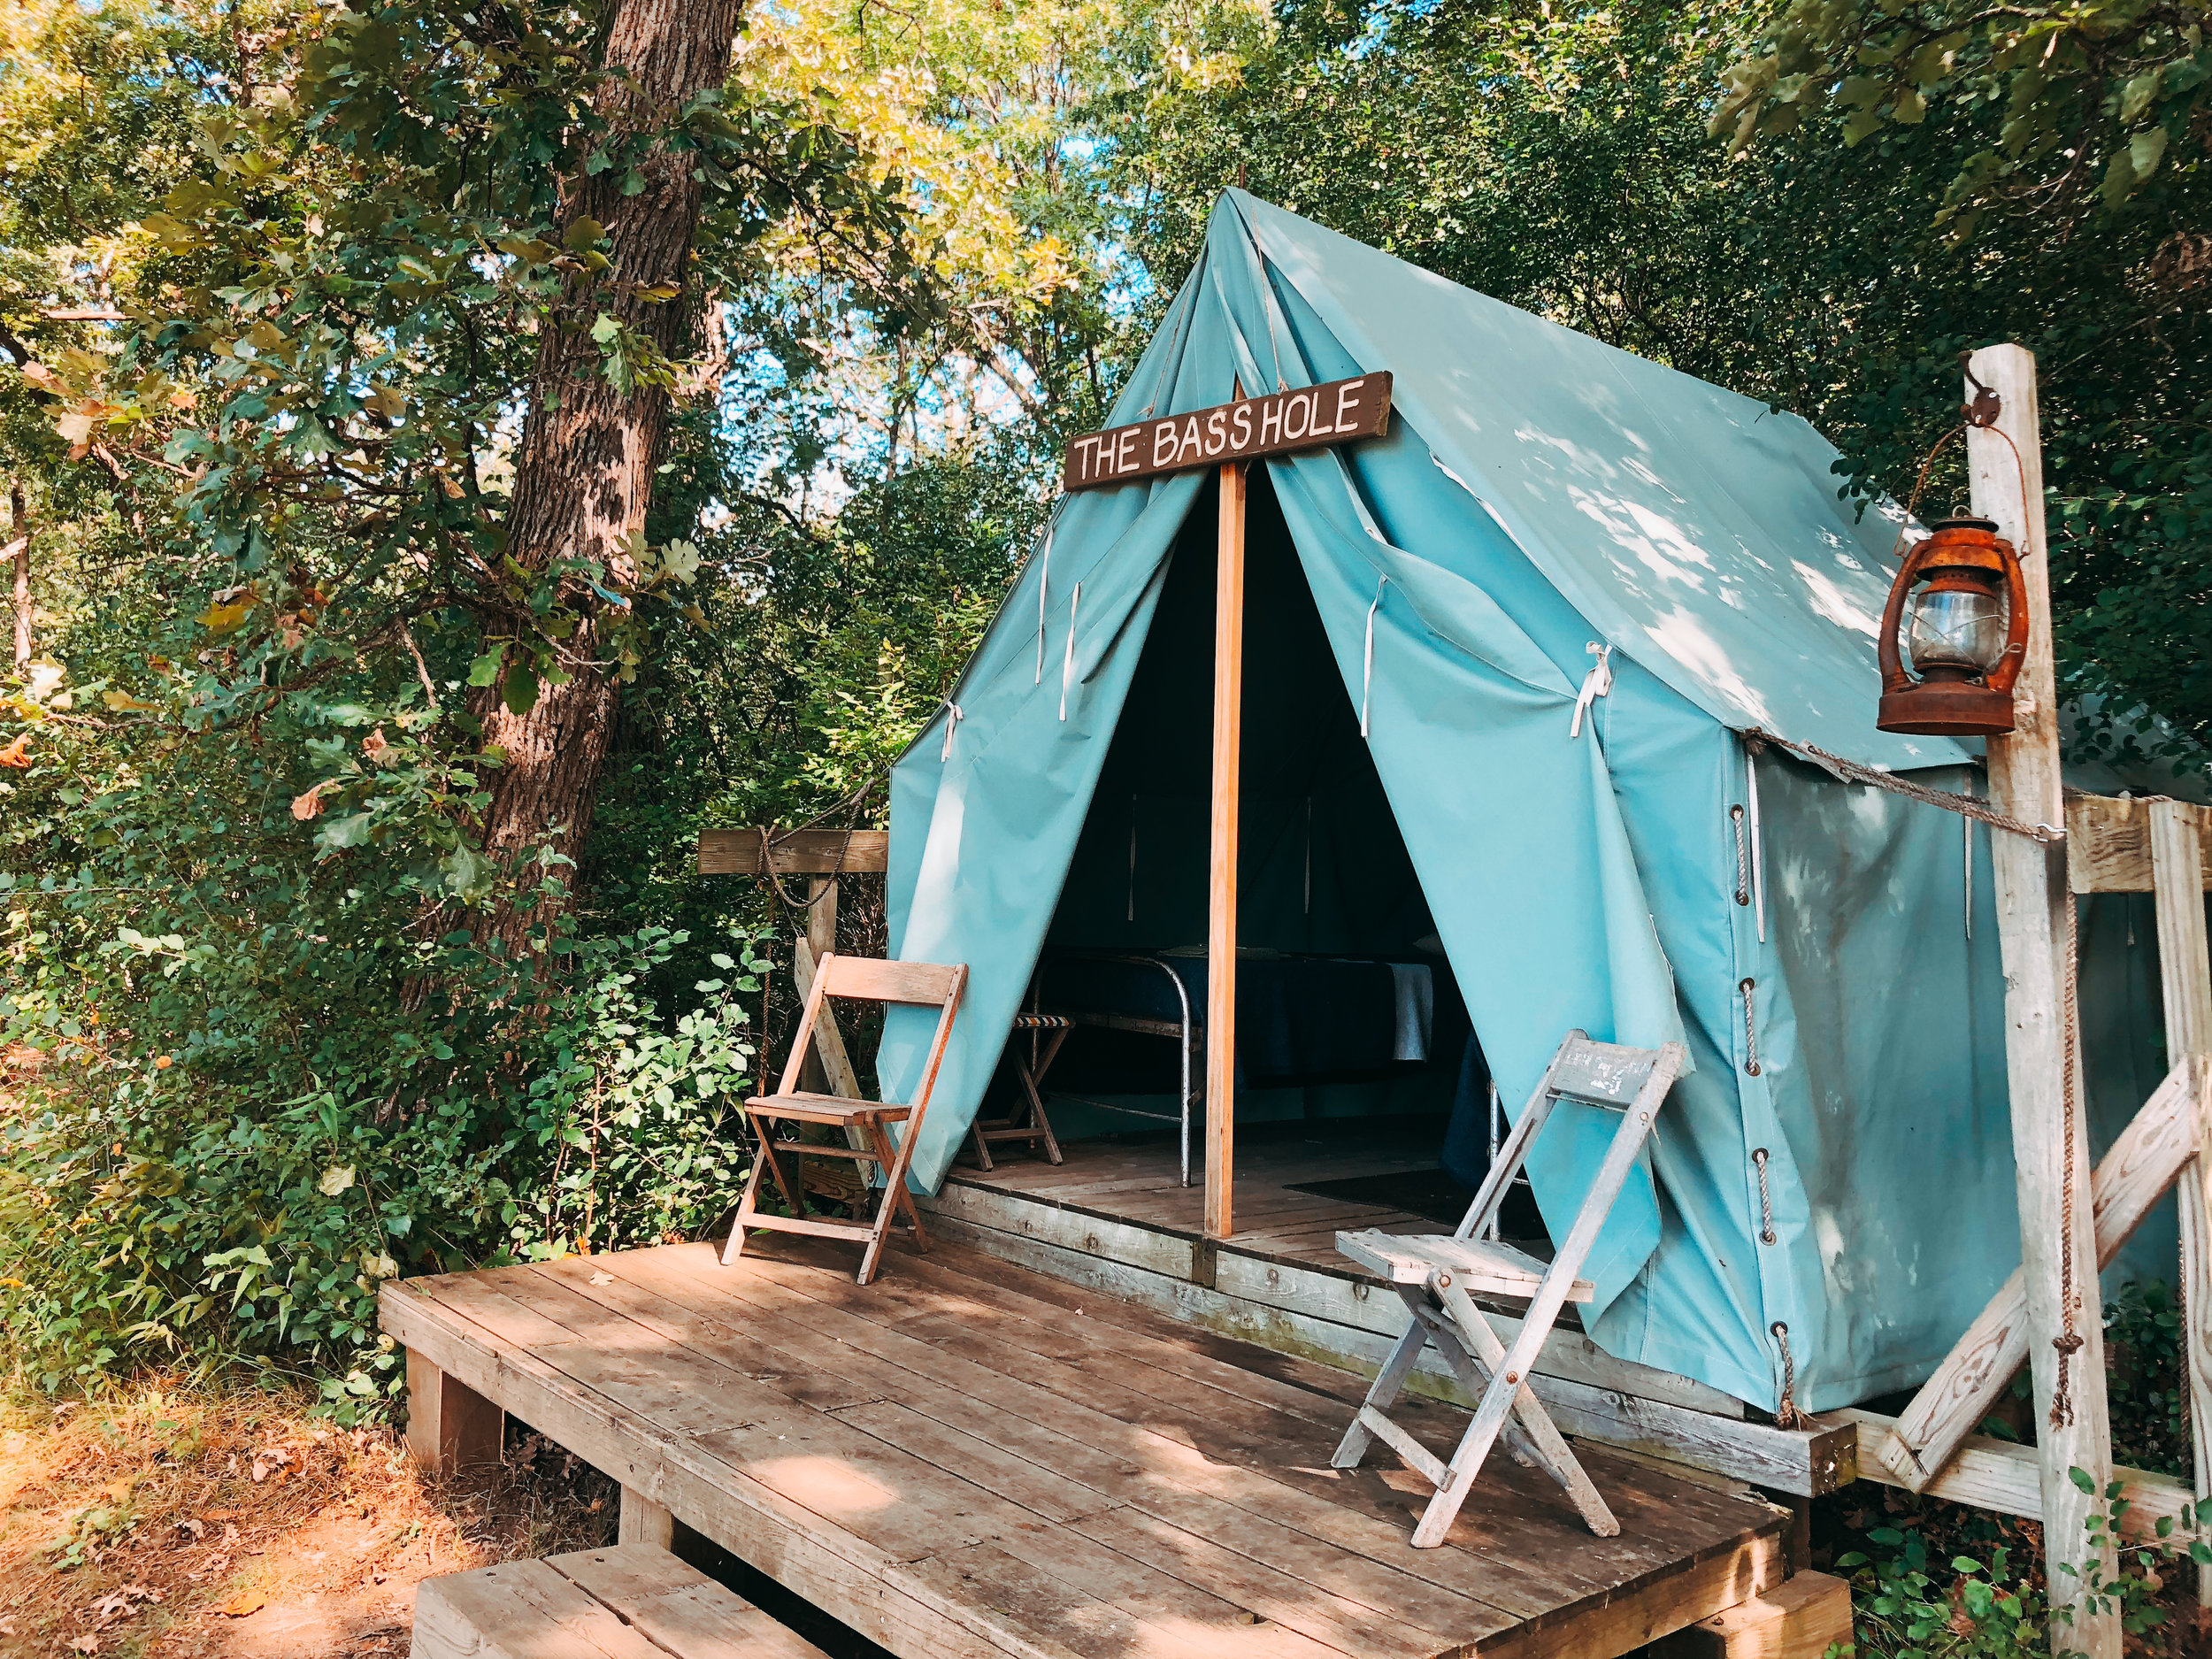 camp_wandawega_tent_glamping_outdoors.jpg